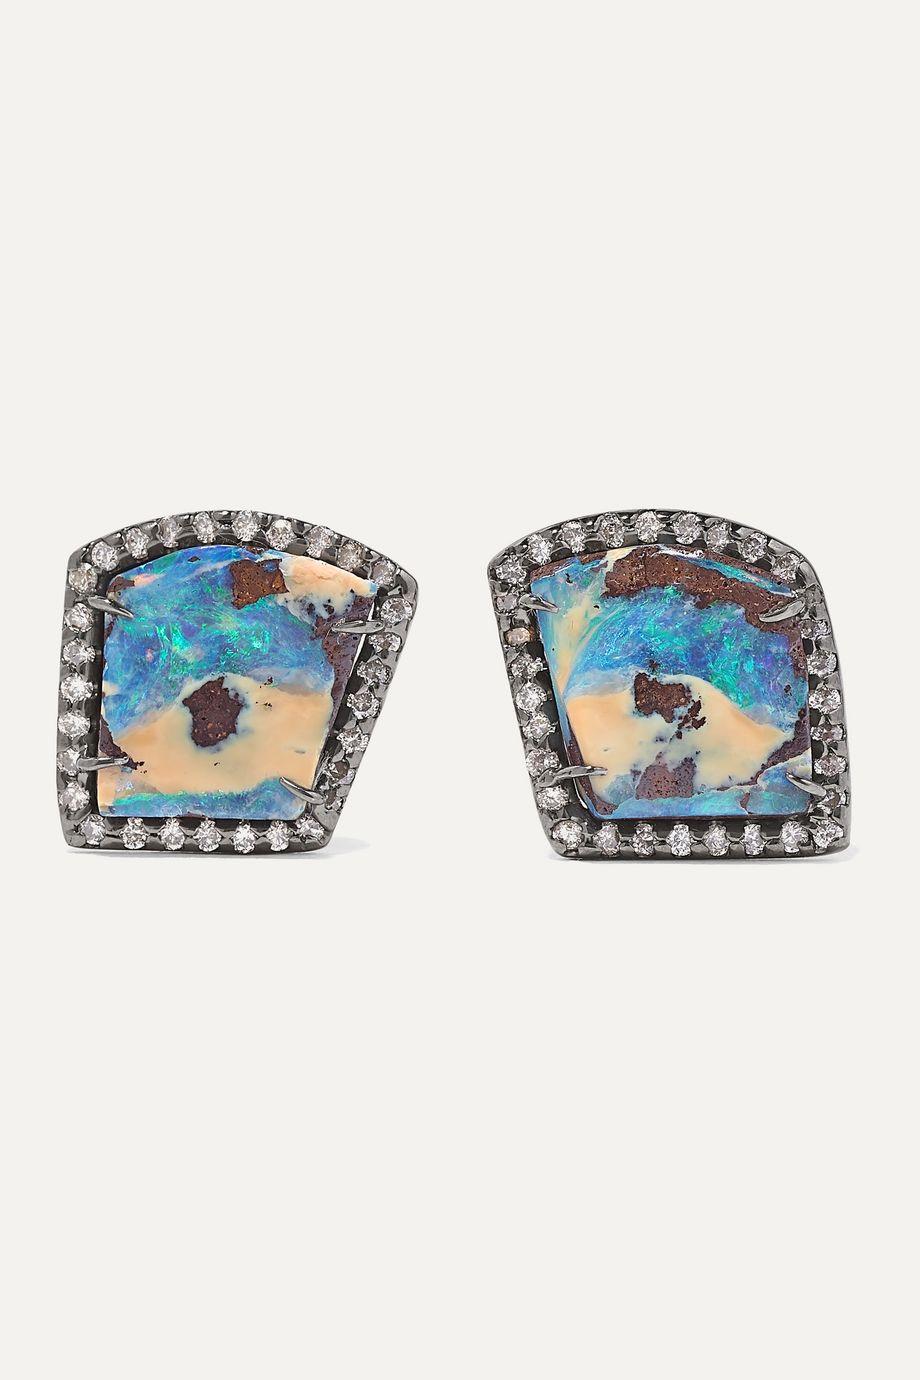 Kimberly McDonald 18-karat blackened white gold, opal and diamond earrings